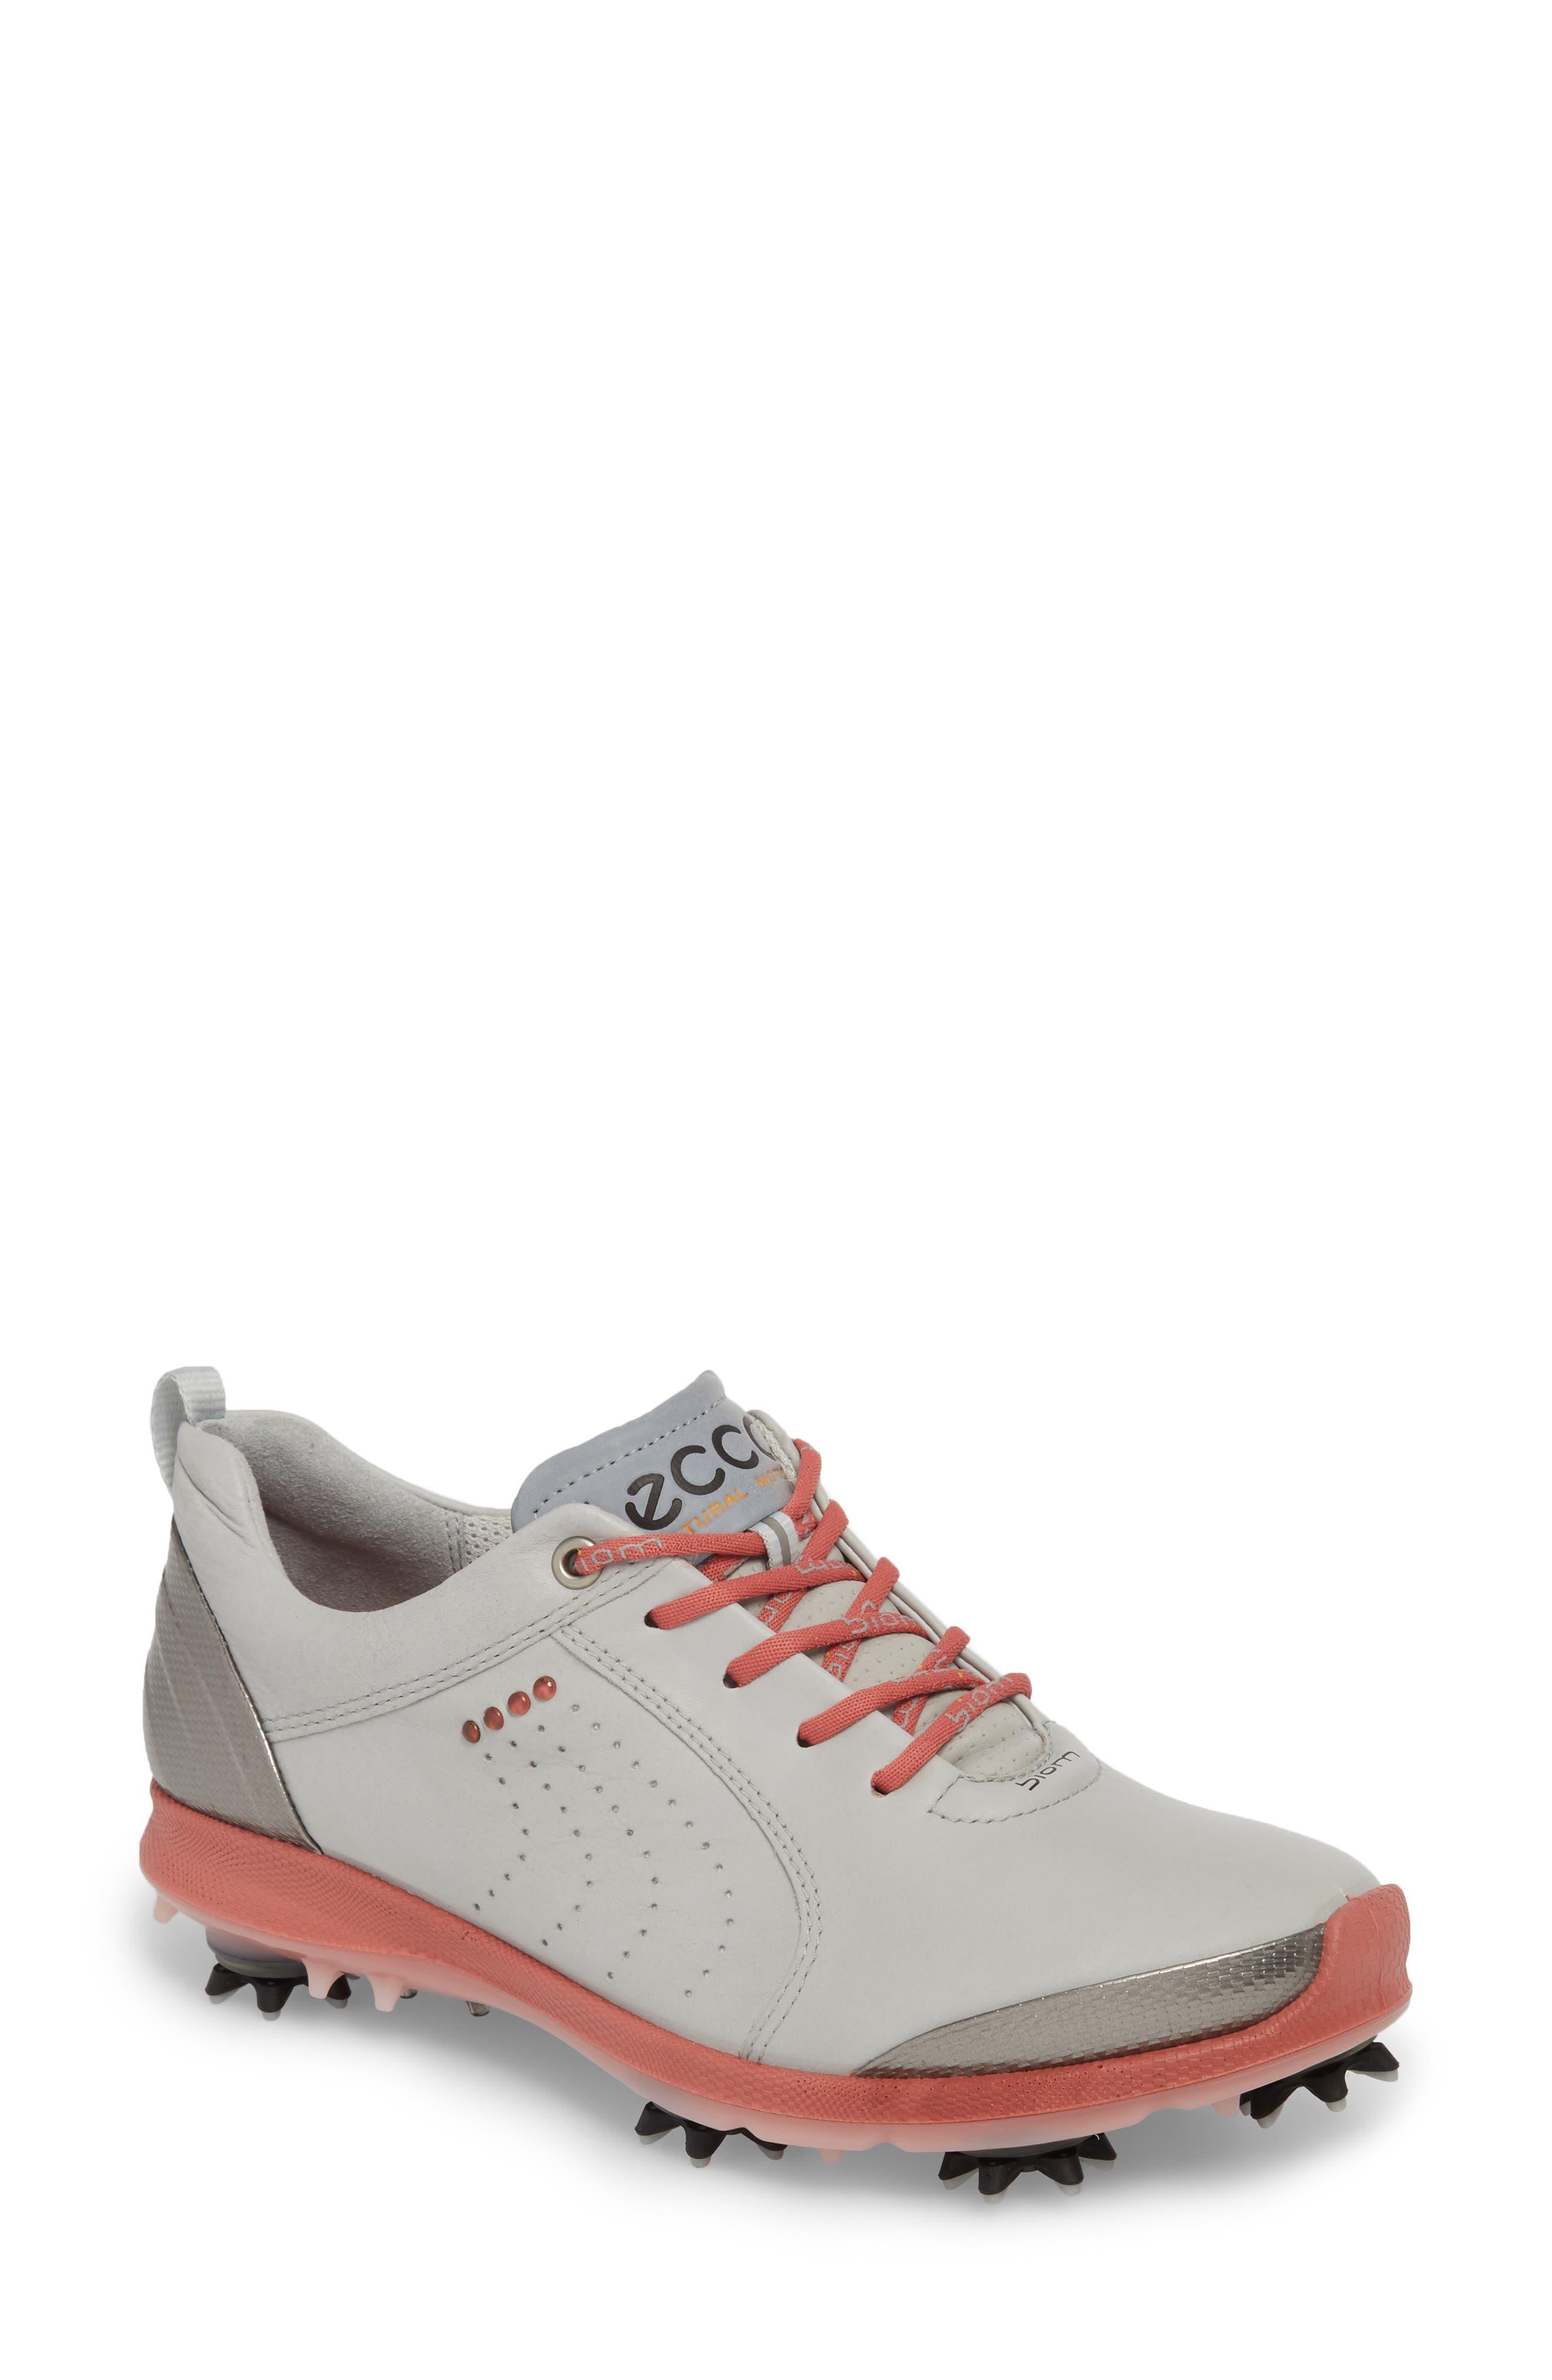 ECCO BIOM 2 Waterproof Golf Shoe, Main, color, 023